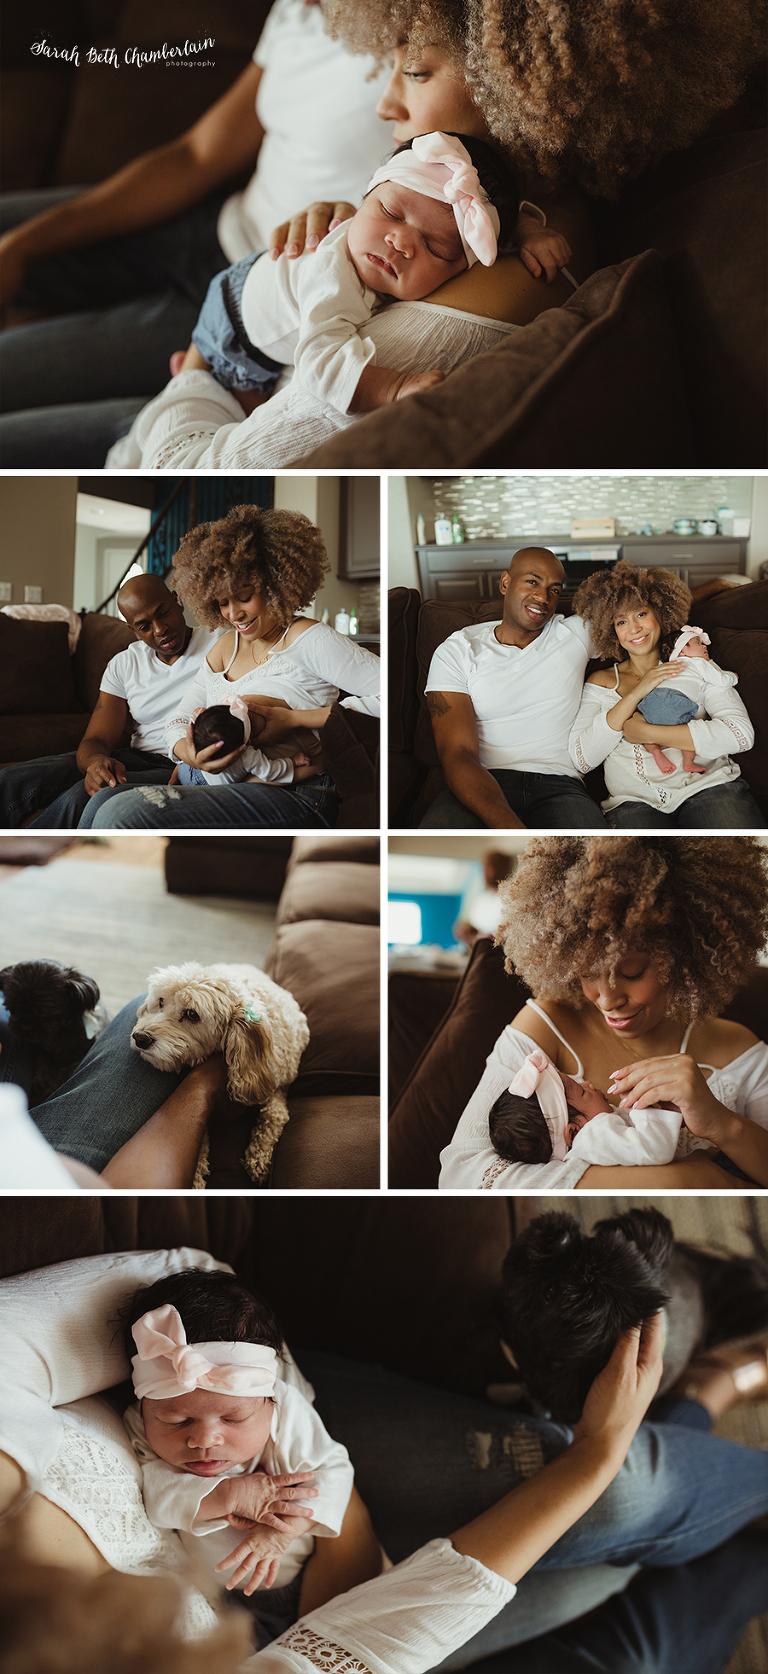 Lucky | Lifestyle Newborn Session | Las Vegas Family & Newborn Photographer | Family Videography | Newborn Film | Baby Photos | Breastfeeding | Motherhood